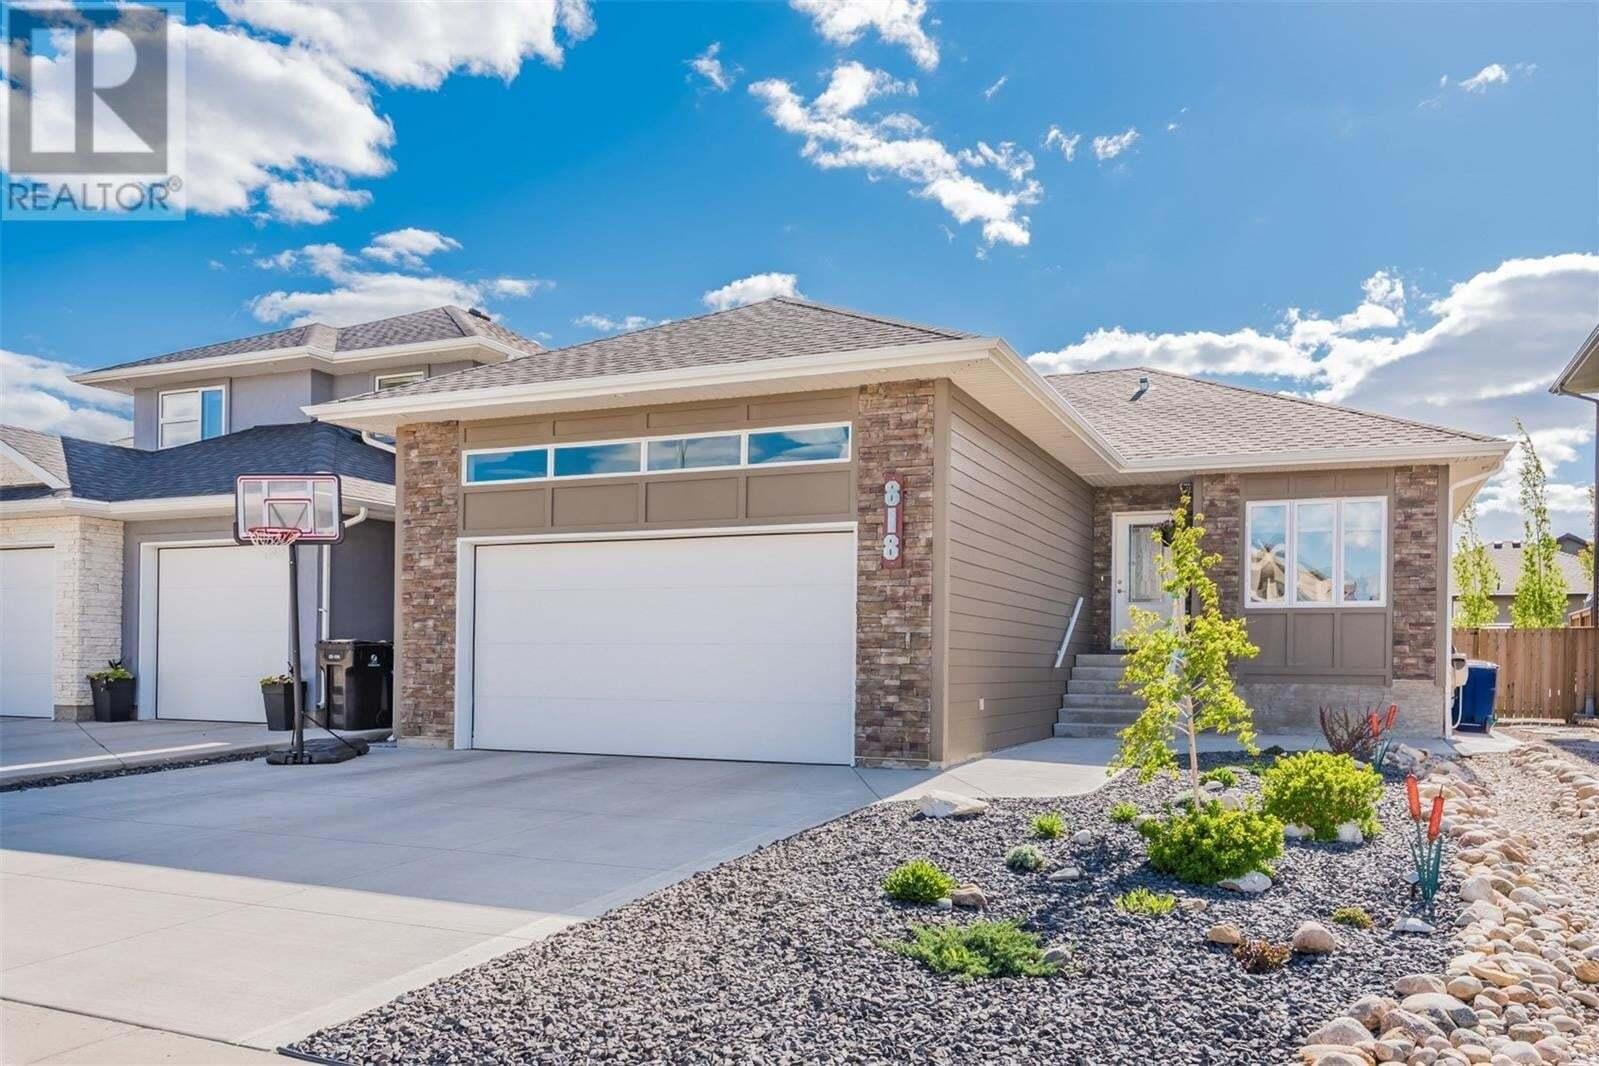 House for sale at 818 Sauer Ln Saskatoon Saskatchewan - MLS: SK809900